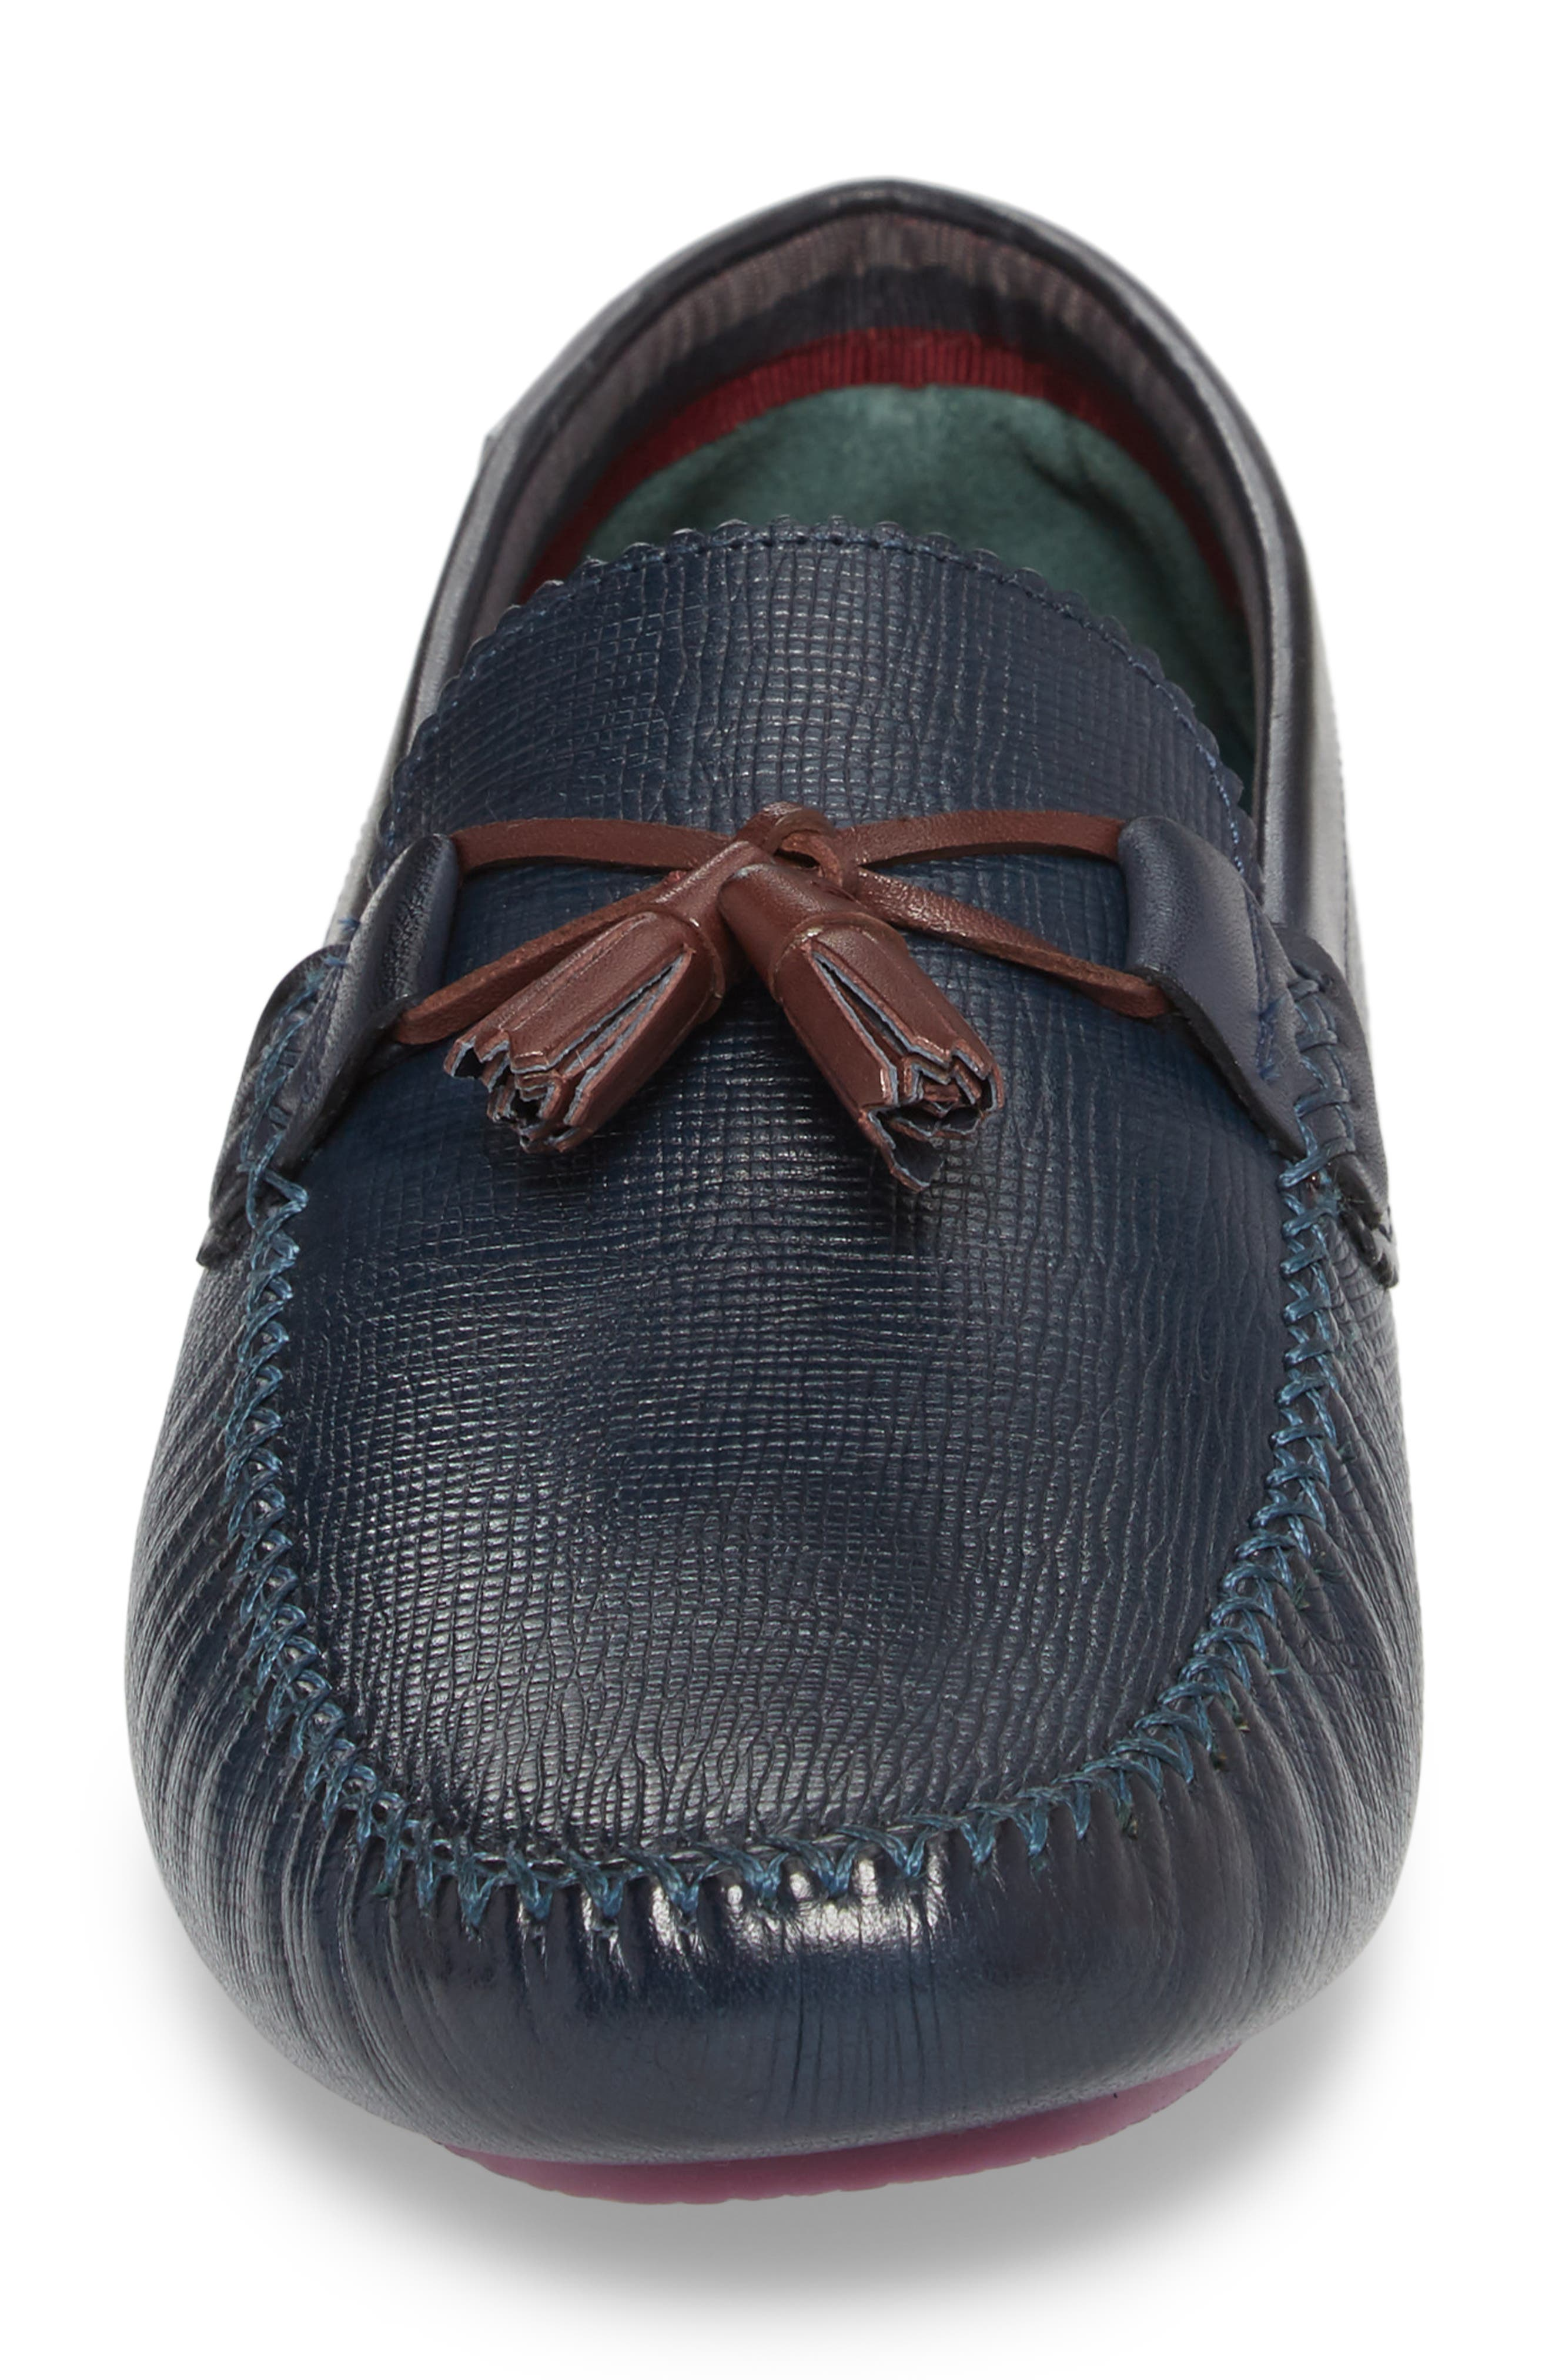 Urbonn Tasseled Driving Loafer,                             Alternate thumbnail 4, color,                             Dark Blue Leather